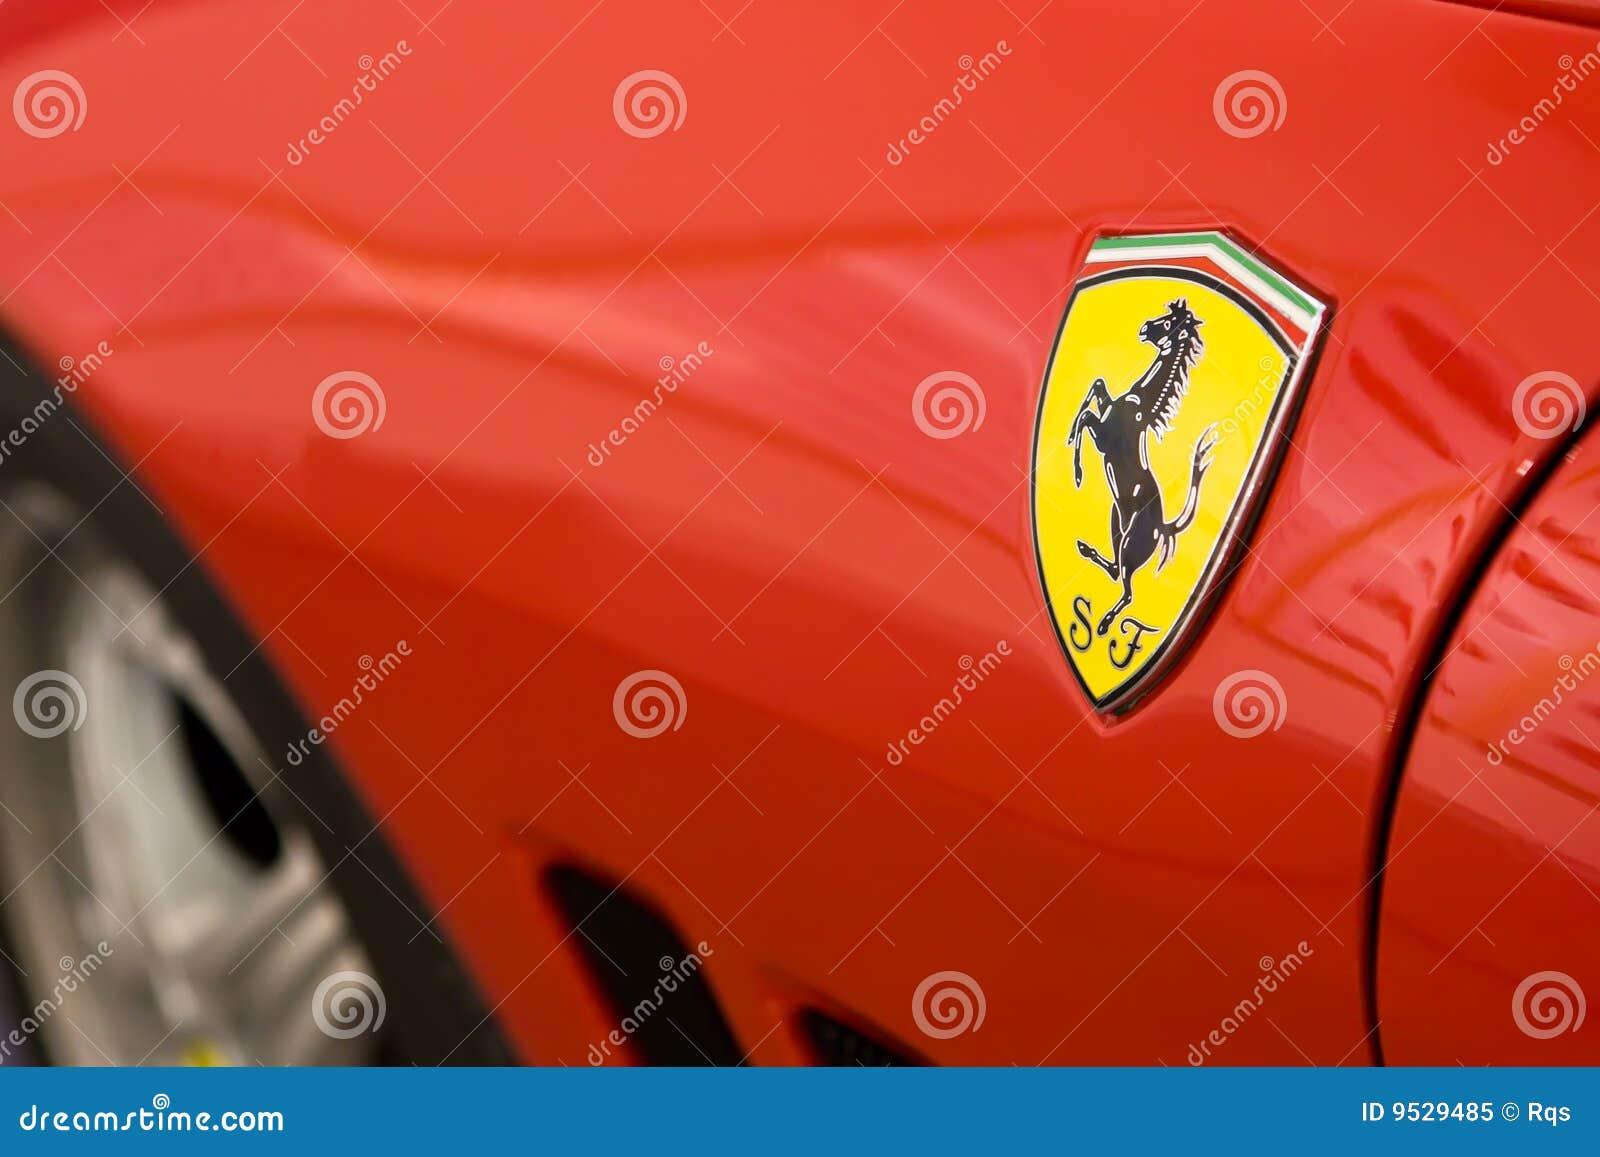 Logo Of Ferrari On Sport Car Editorial Image Image Of Show